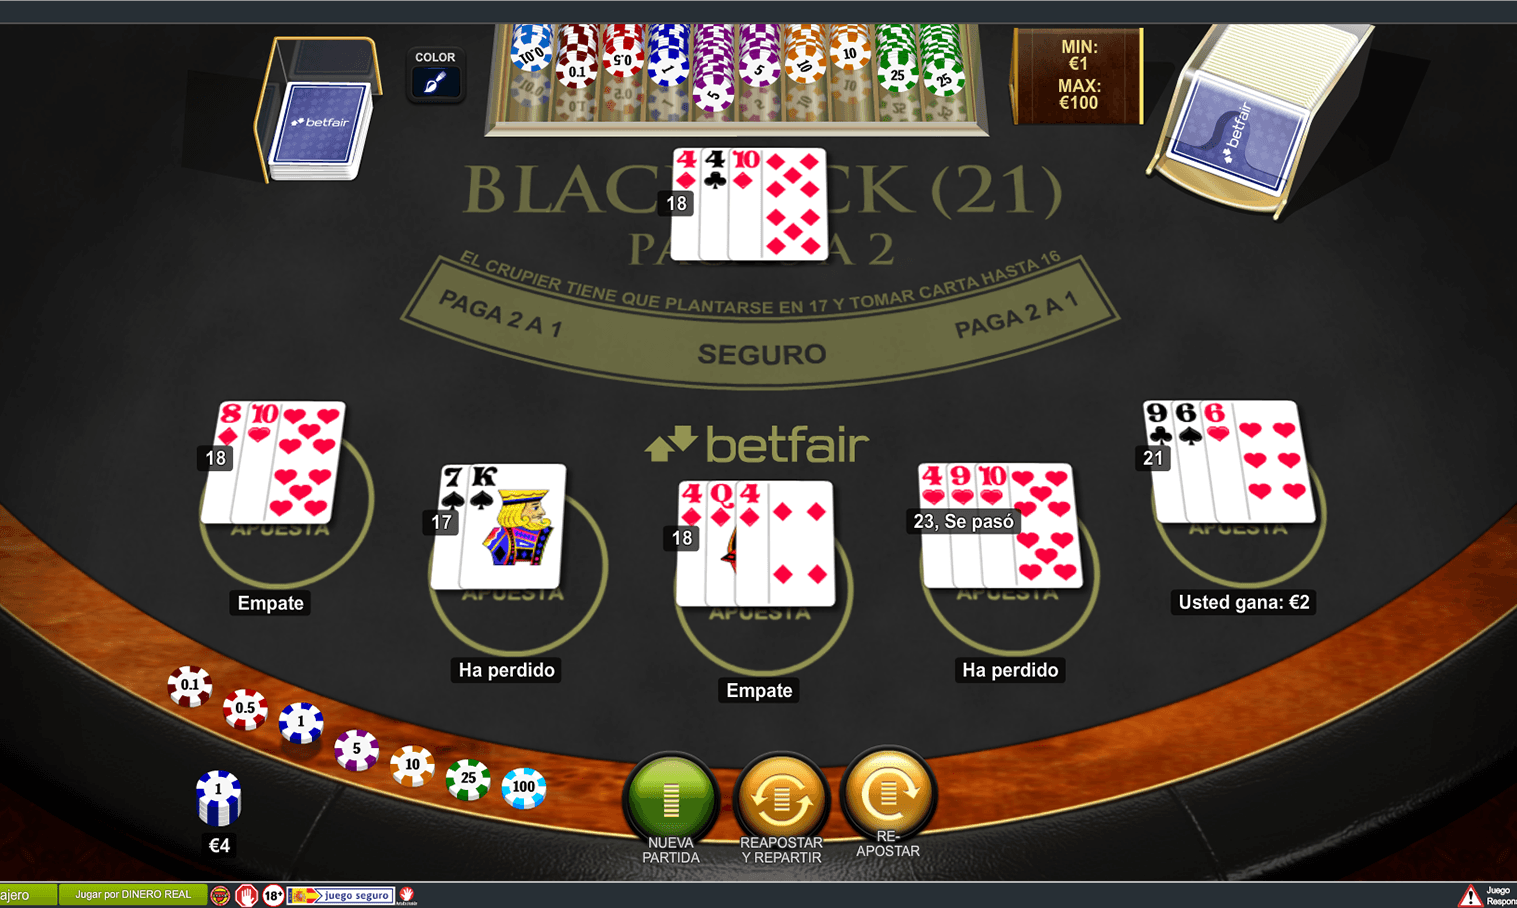 Casino online real 50€ gratis BETFAIR-215628